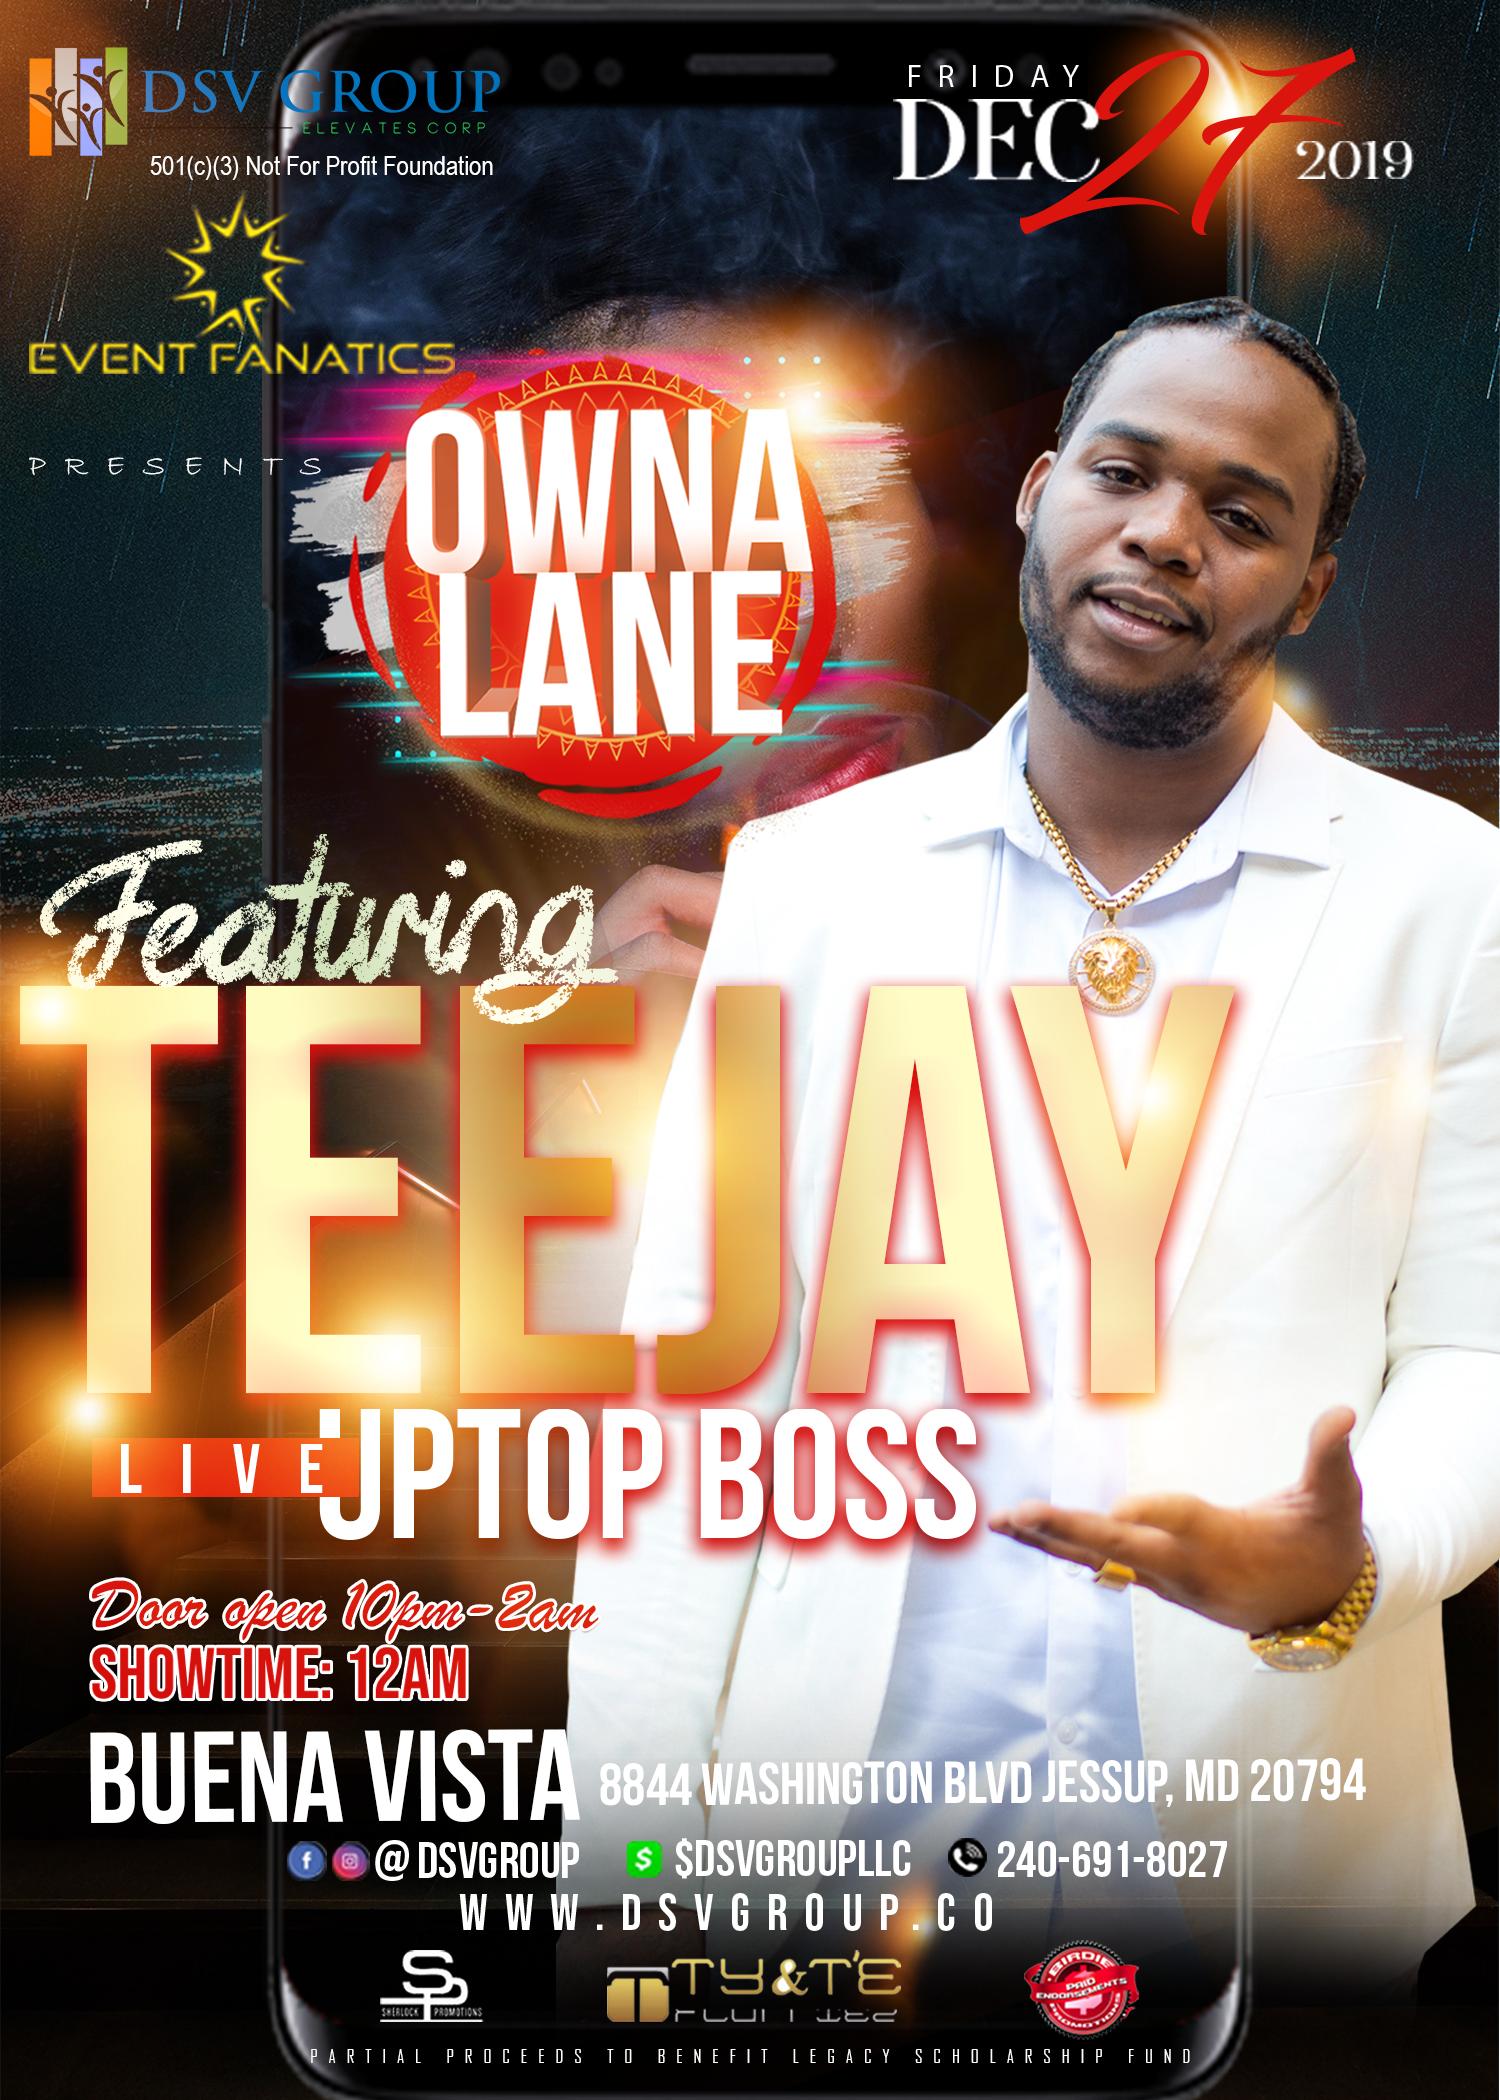 Owna Lane feat. Teejay Uptop Boss – December 27, 2019